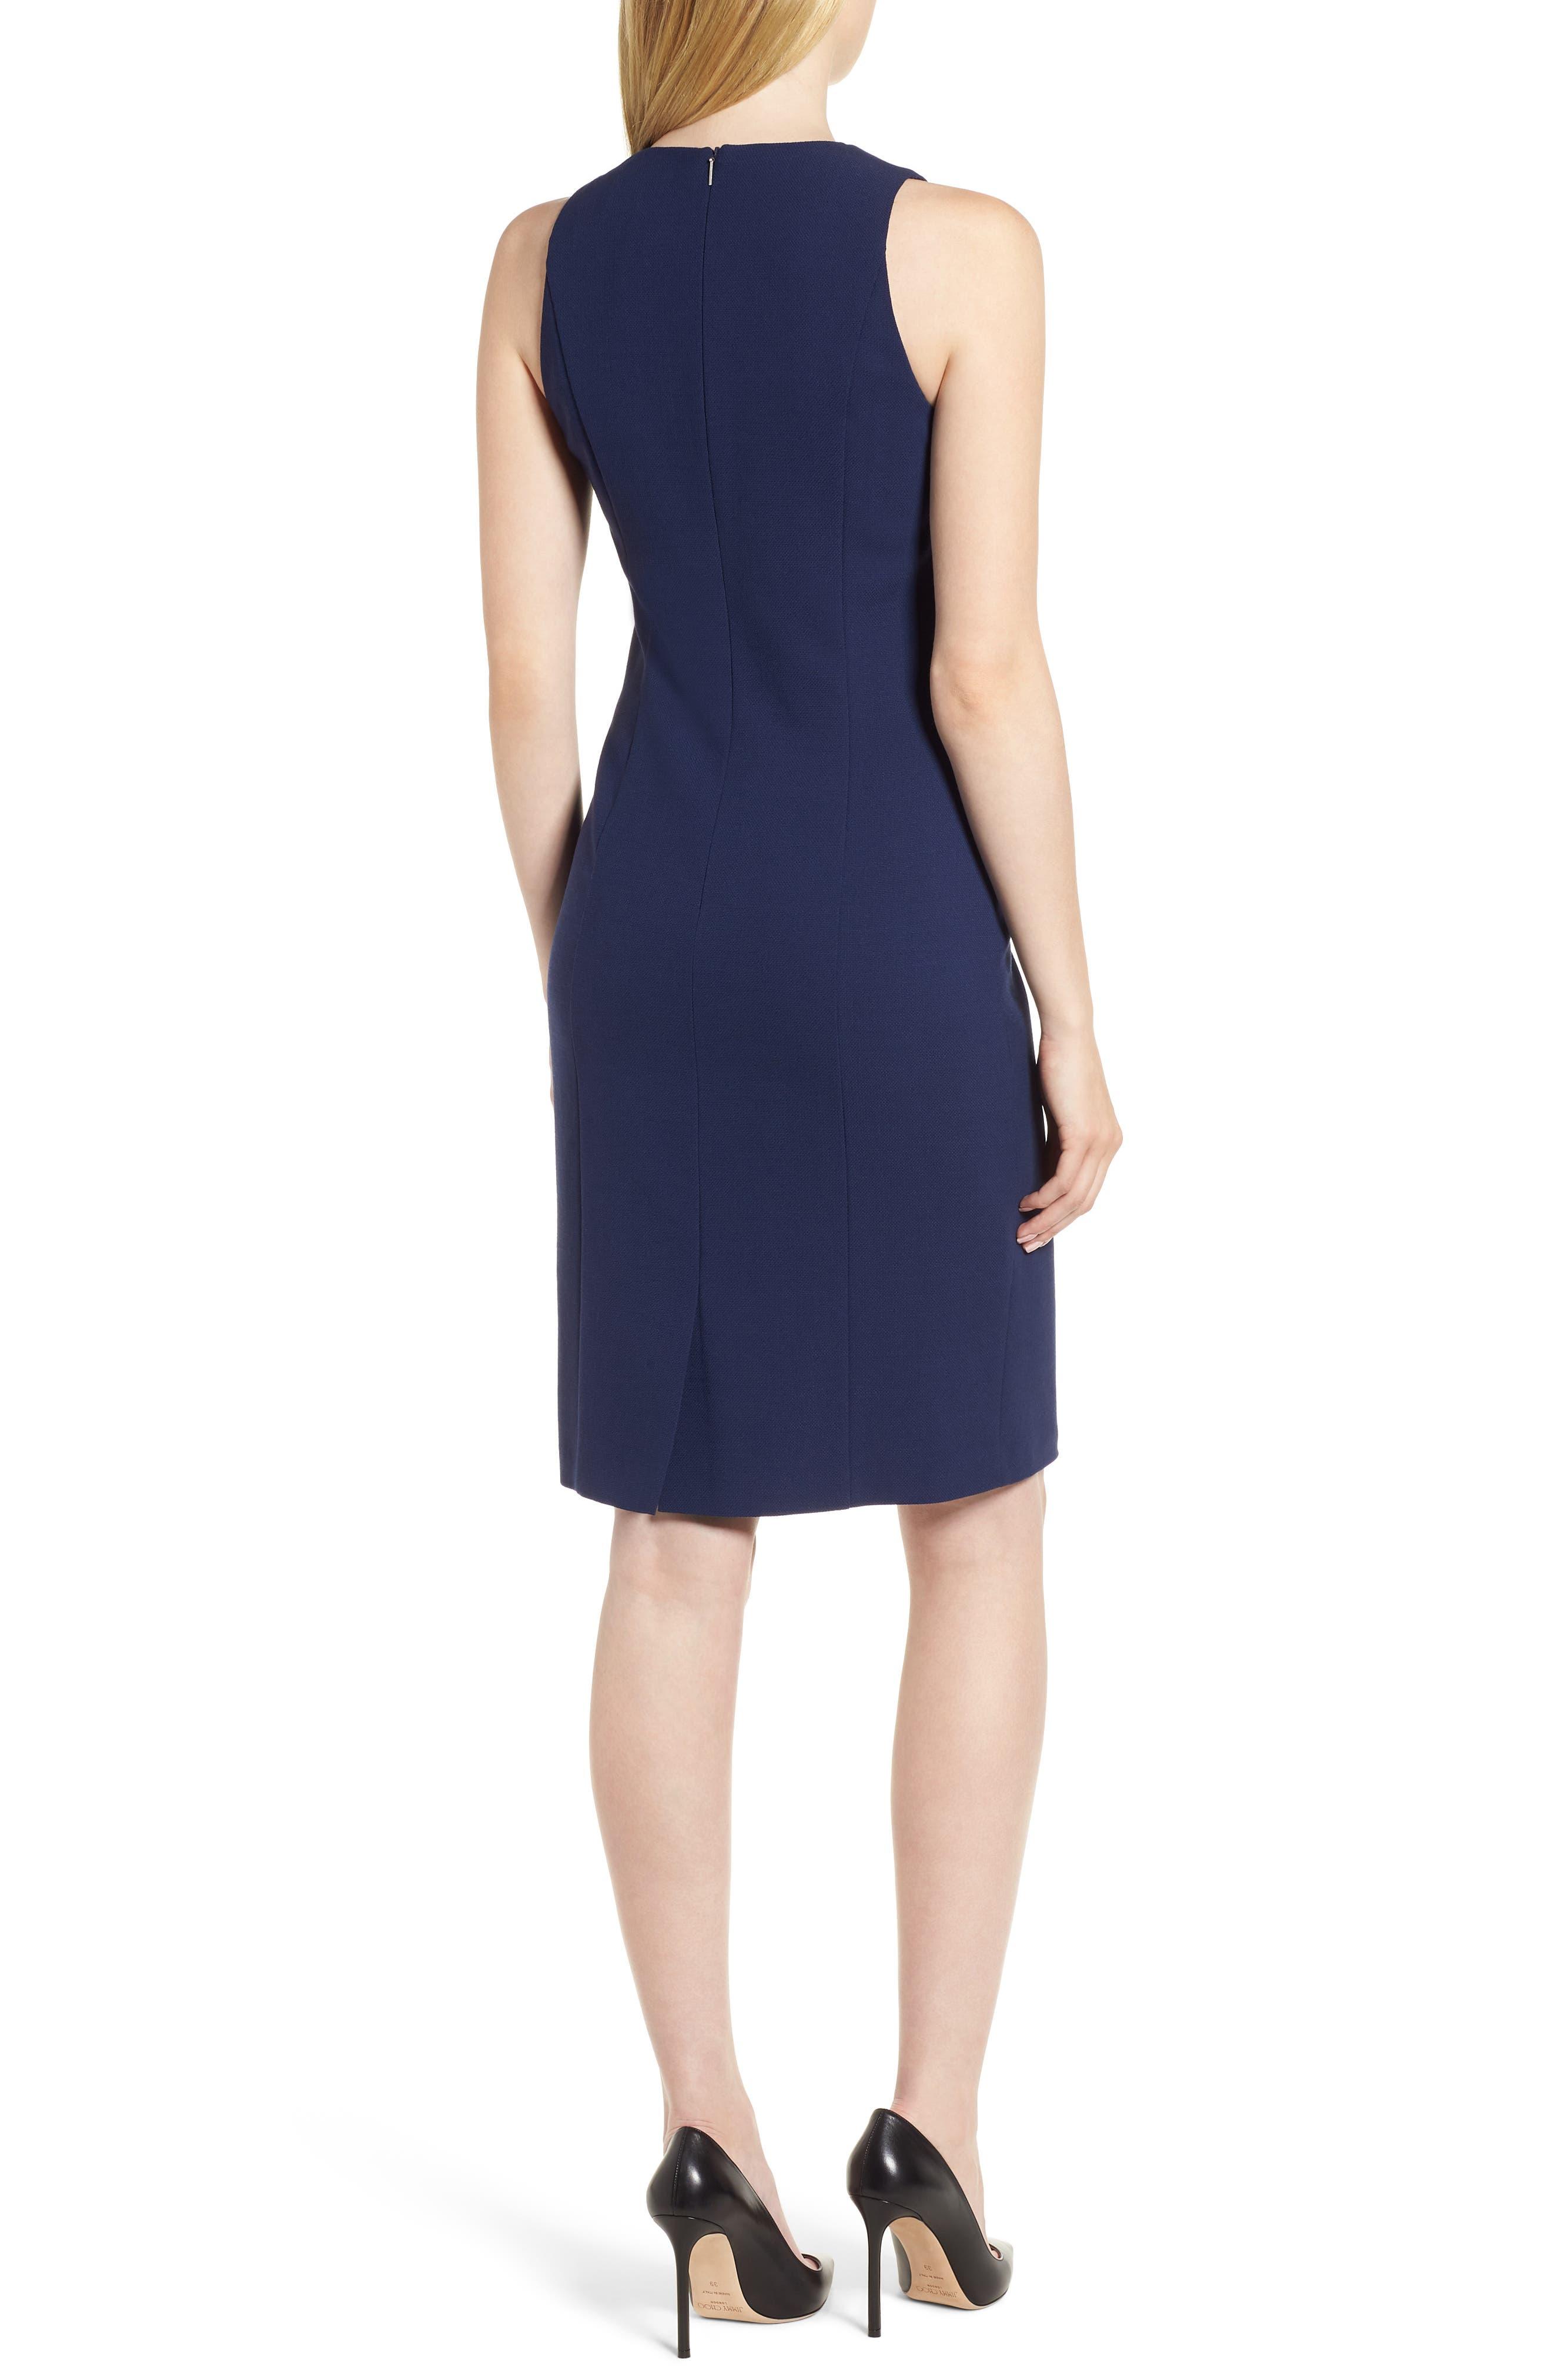 Dibalena Texture Stretch Dress,                             Alternate thumbnail 2, color,                             425